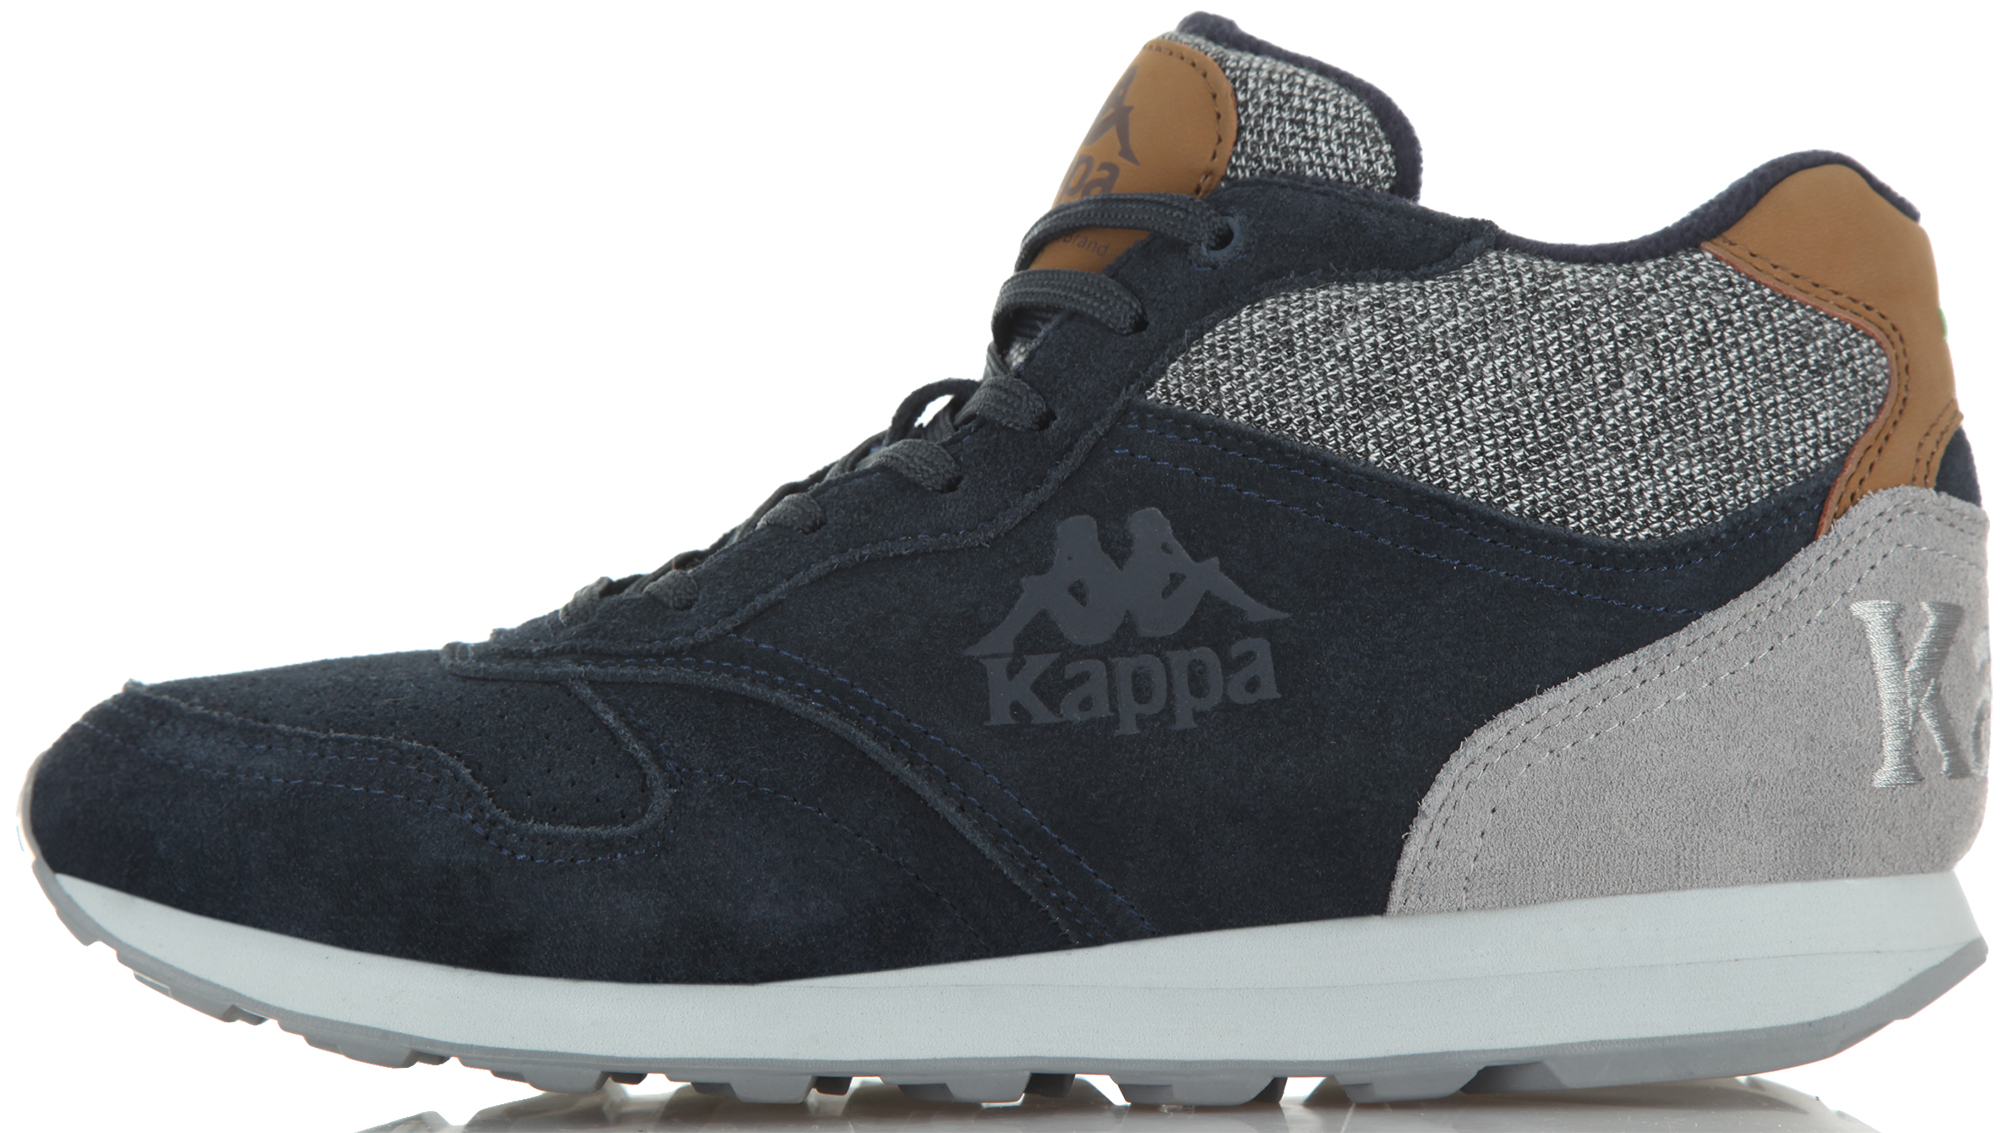 Kappa Кроссовки утепленные мужские Kappa Authentic Run Mid, размер 40 kappa кеды мужские kappa teron